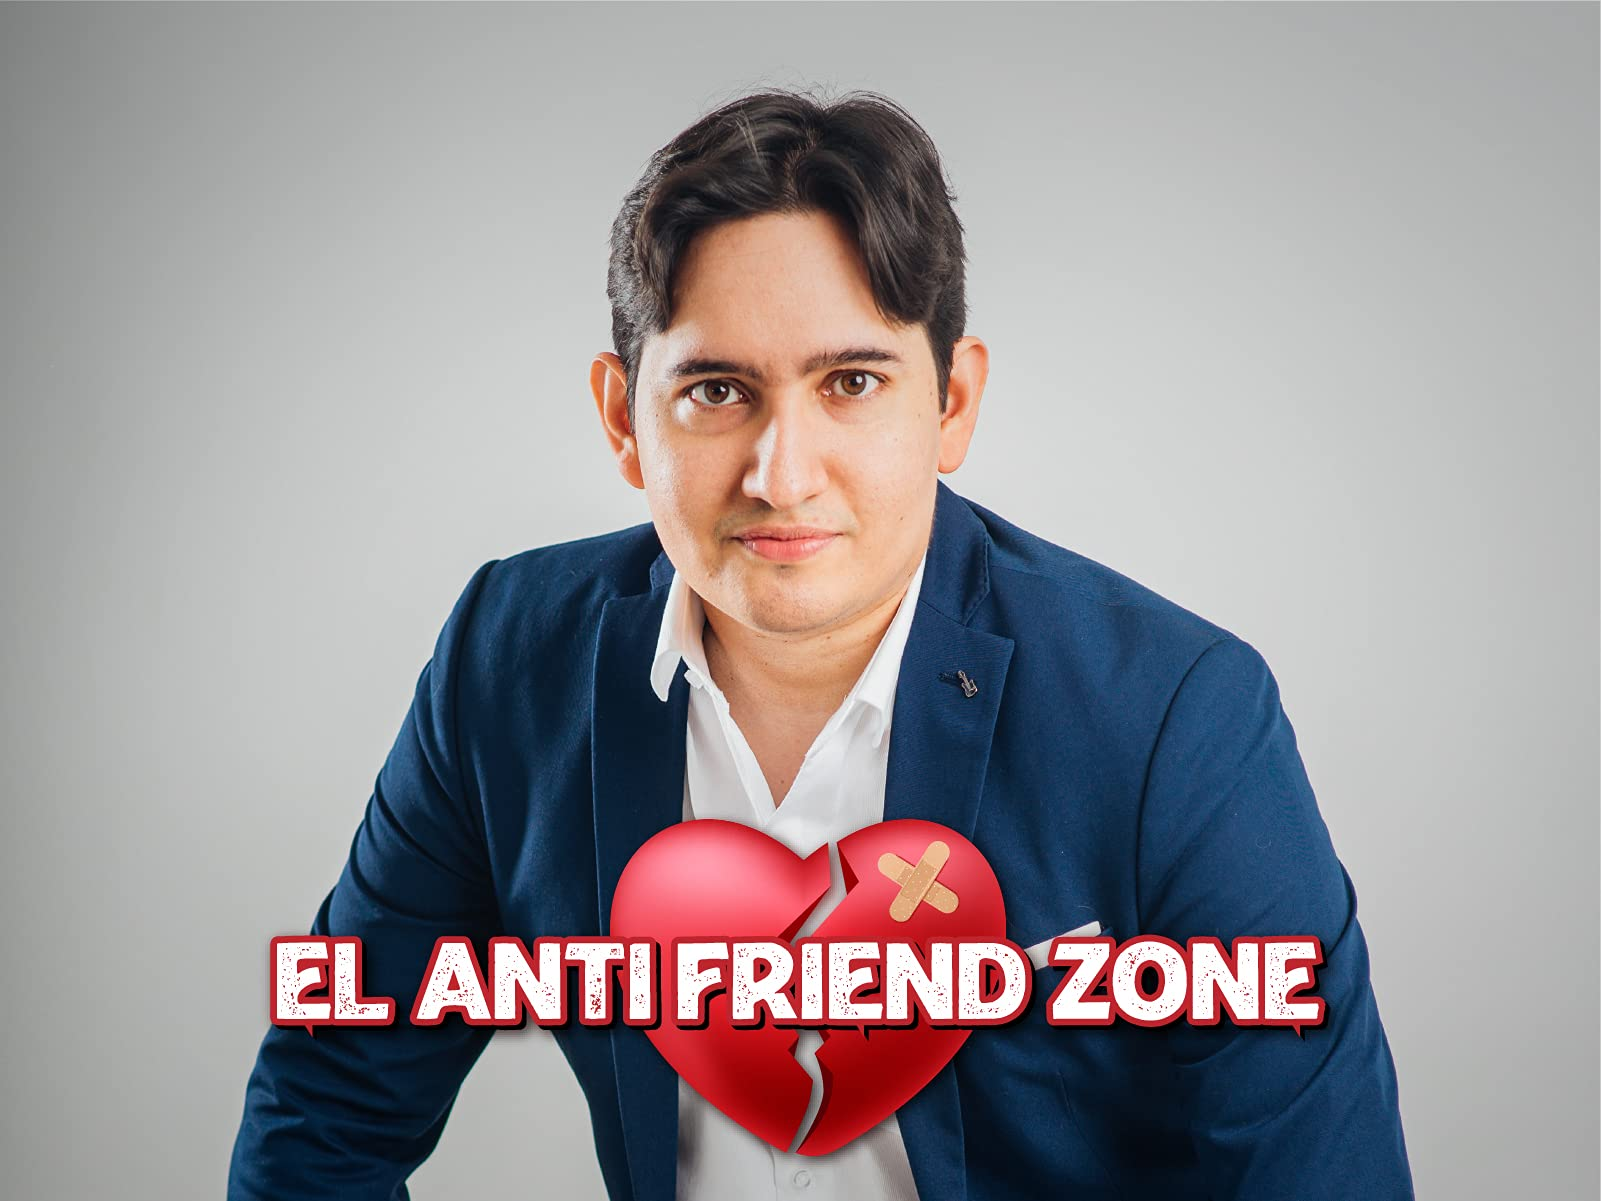 Clip: El Anti-Friendzone - Season 1